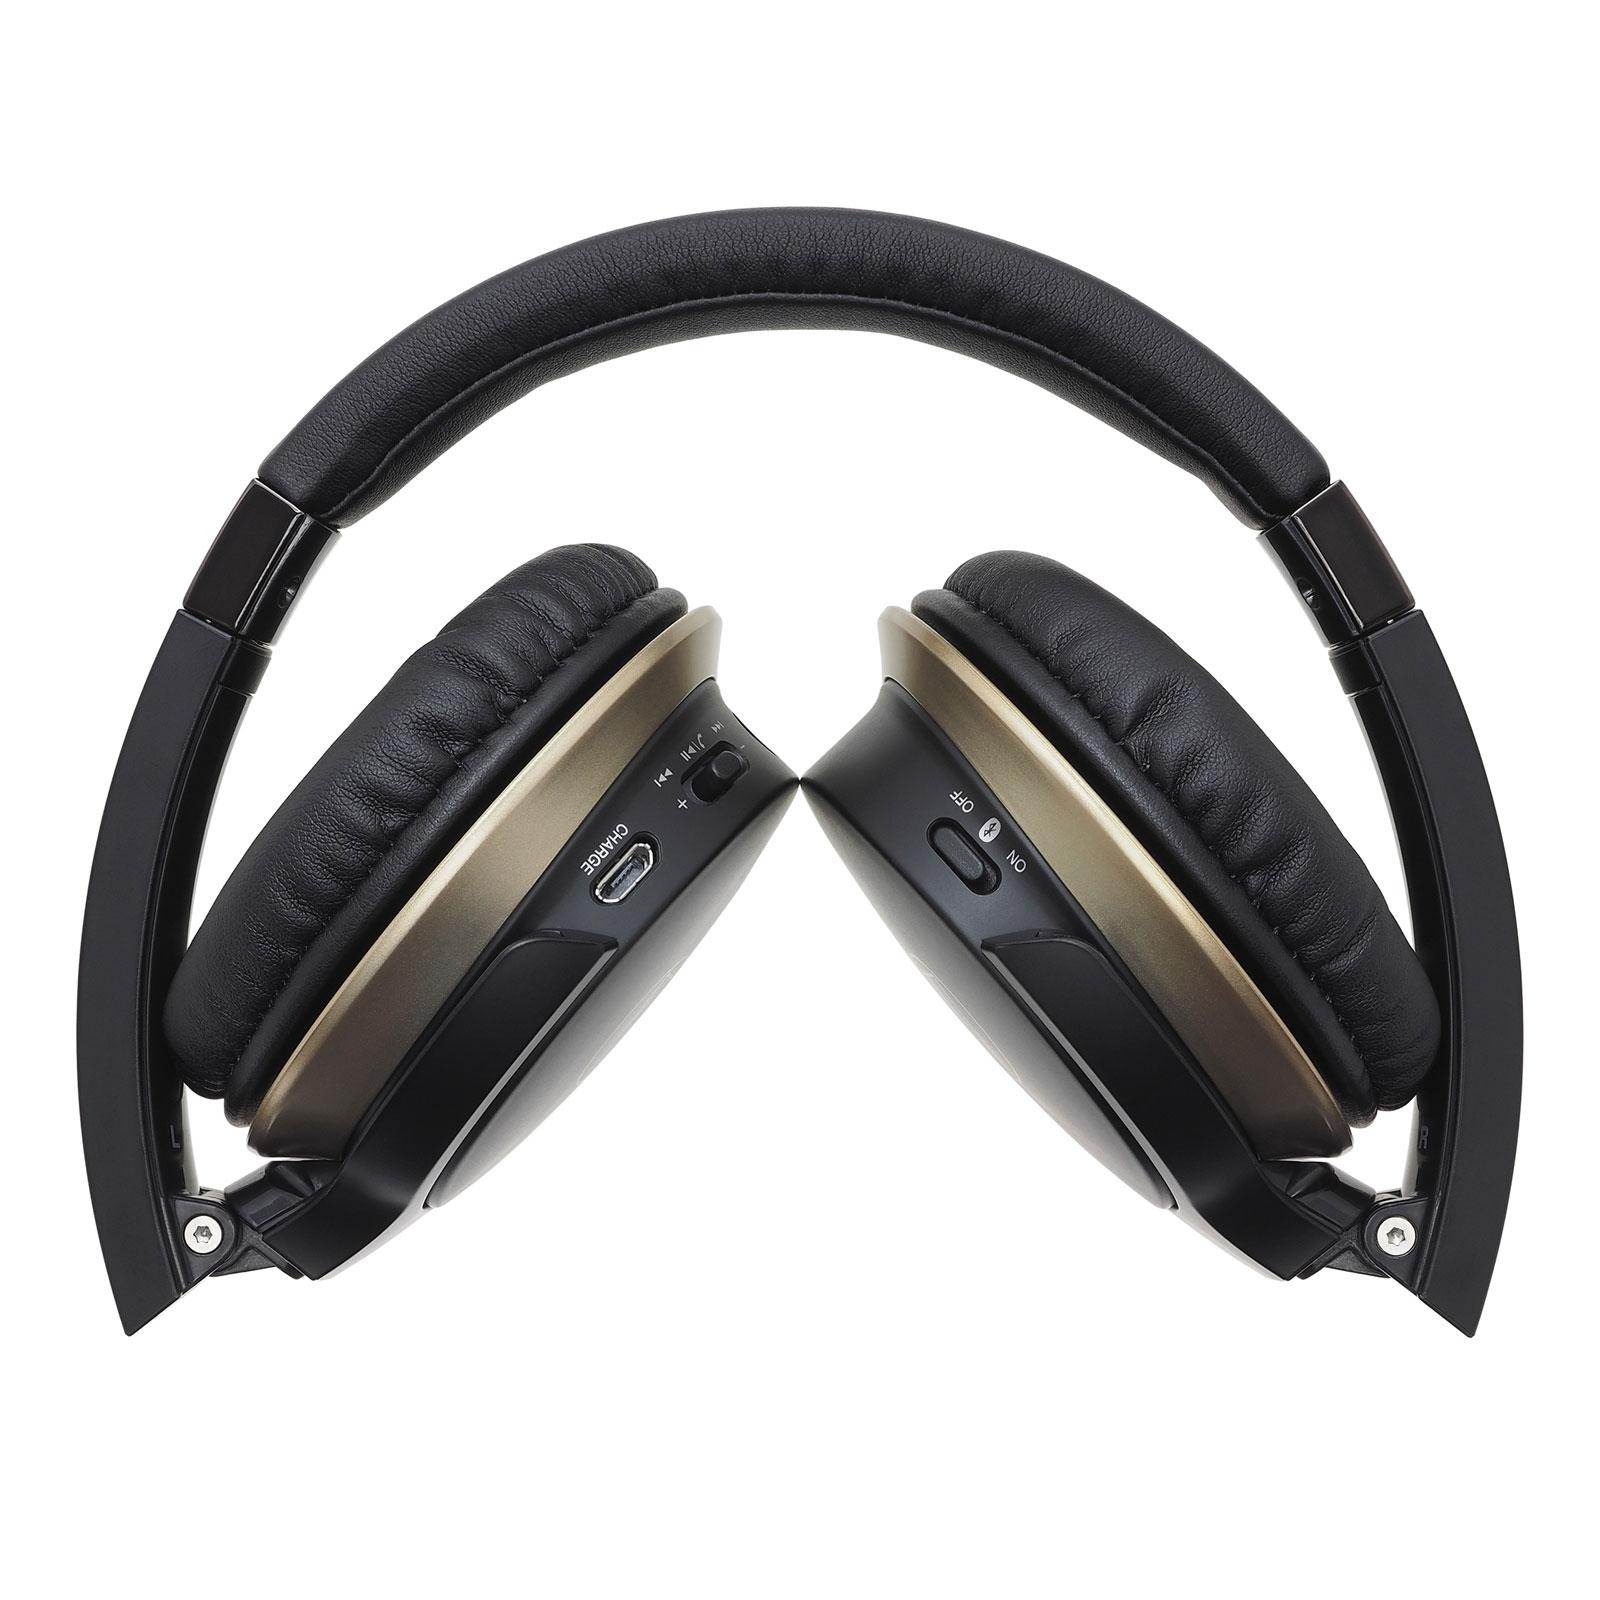 audio technica ath ar3bt noir casque audio technica sur. Black Bedroom Furniture Sets. Home Design Ideas